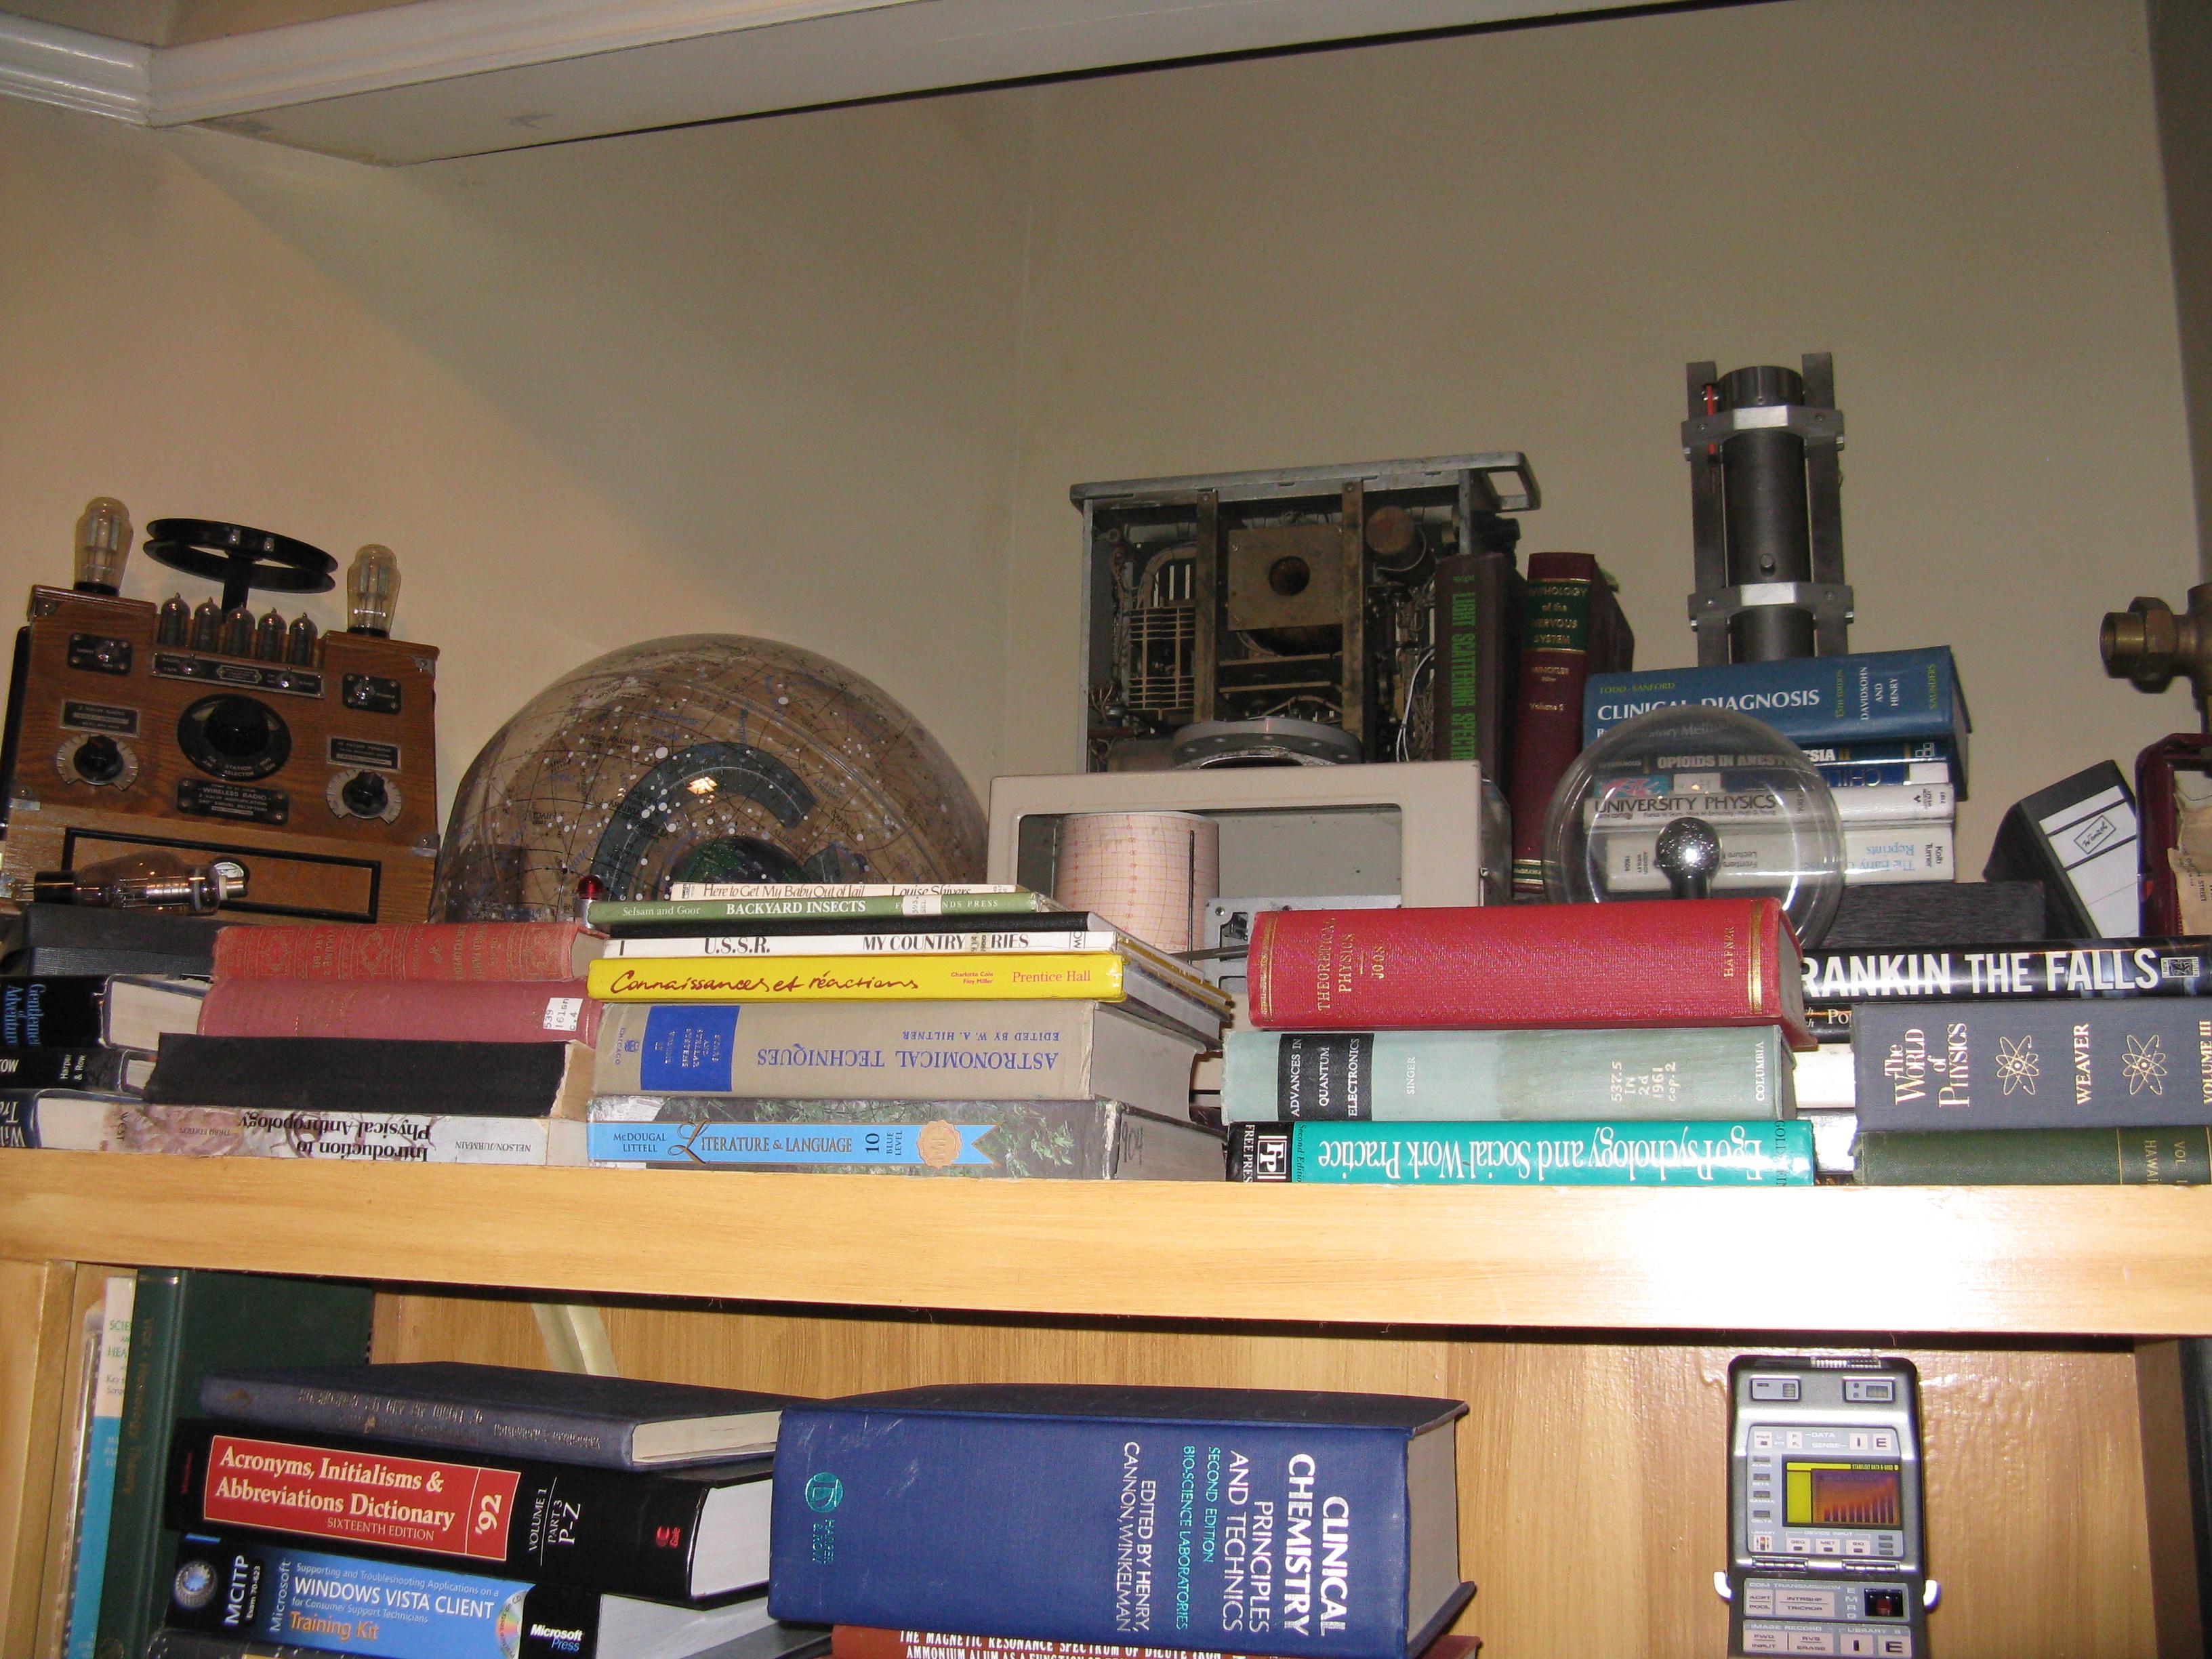 File The Bang Theory Apartment 4a Bookshelf 6163980714 Jpg